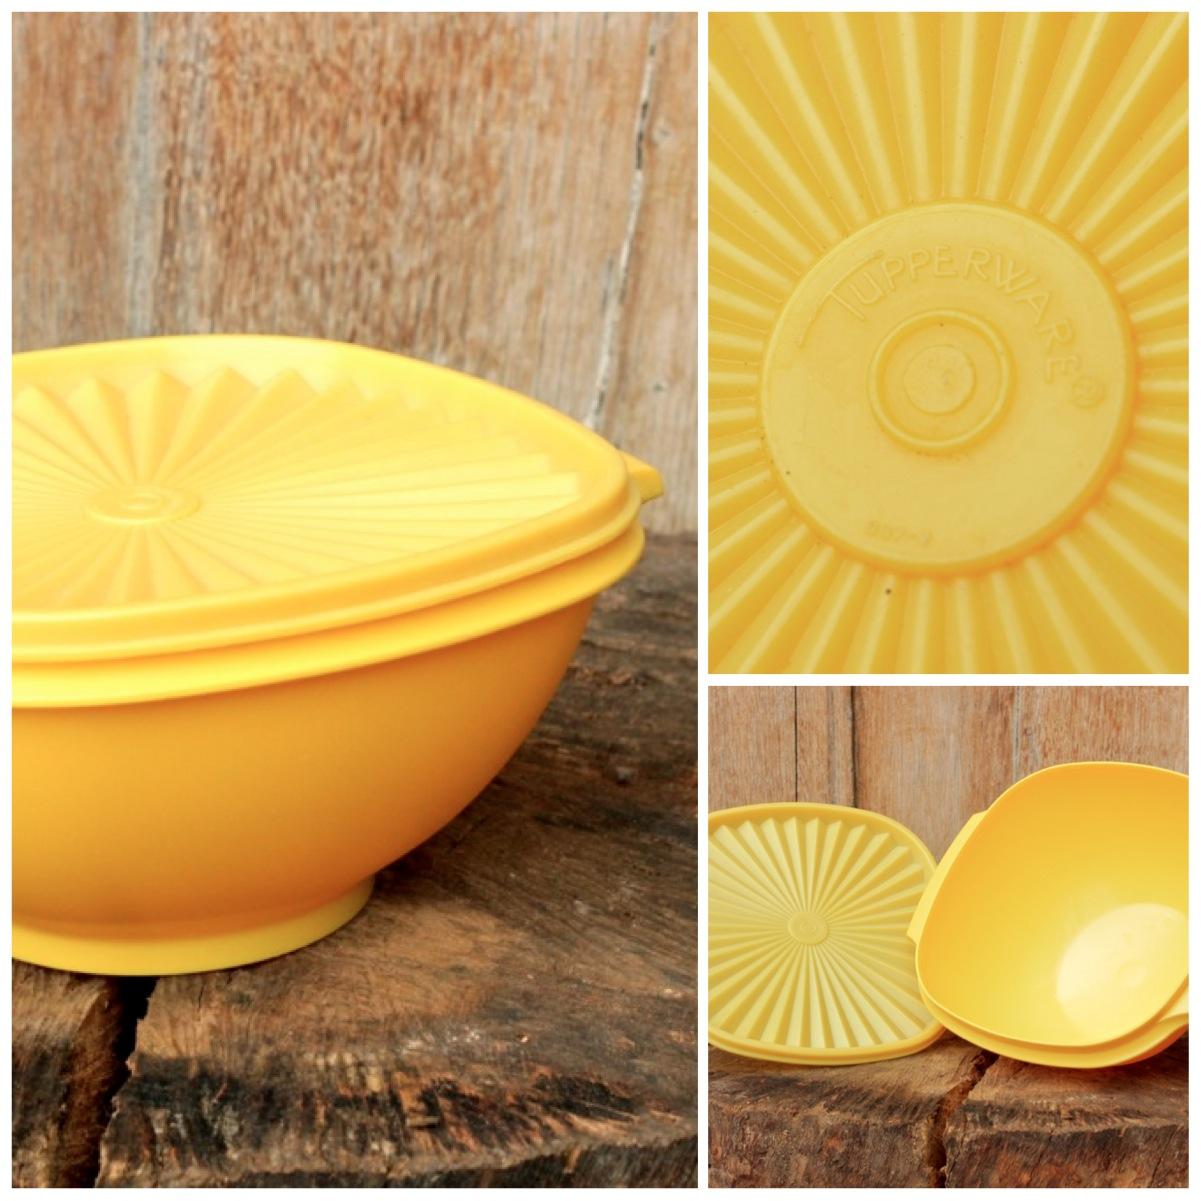 Friday's Featured Item – 1970's Retro Vintage Tupperware Box, Bright Yellow!